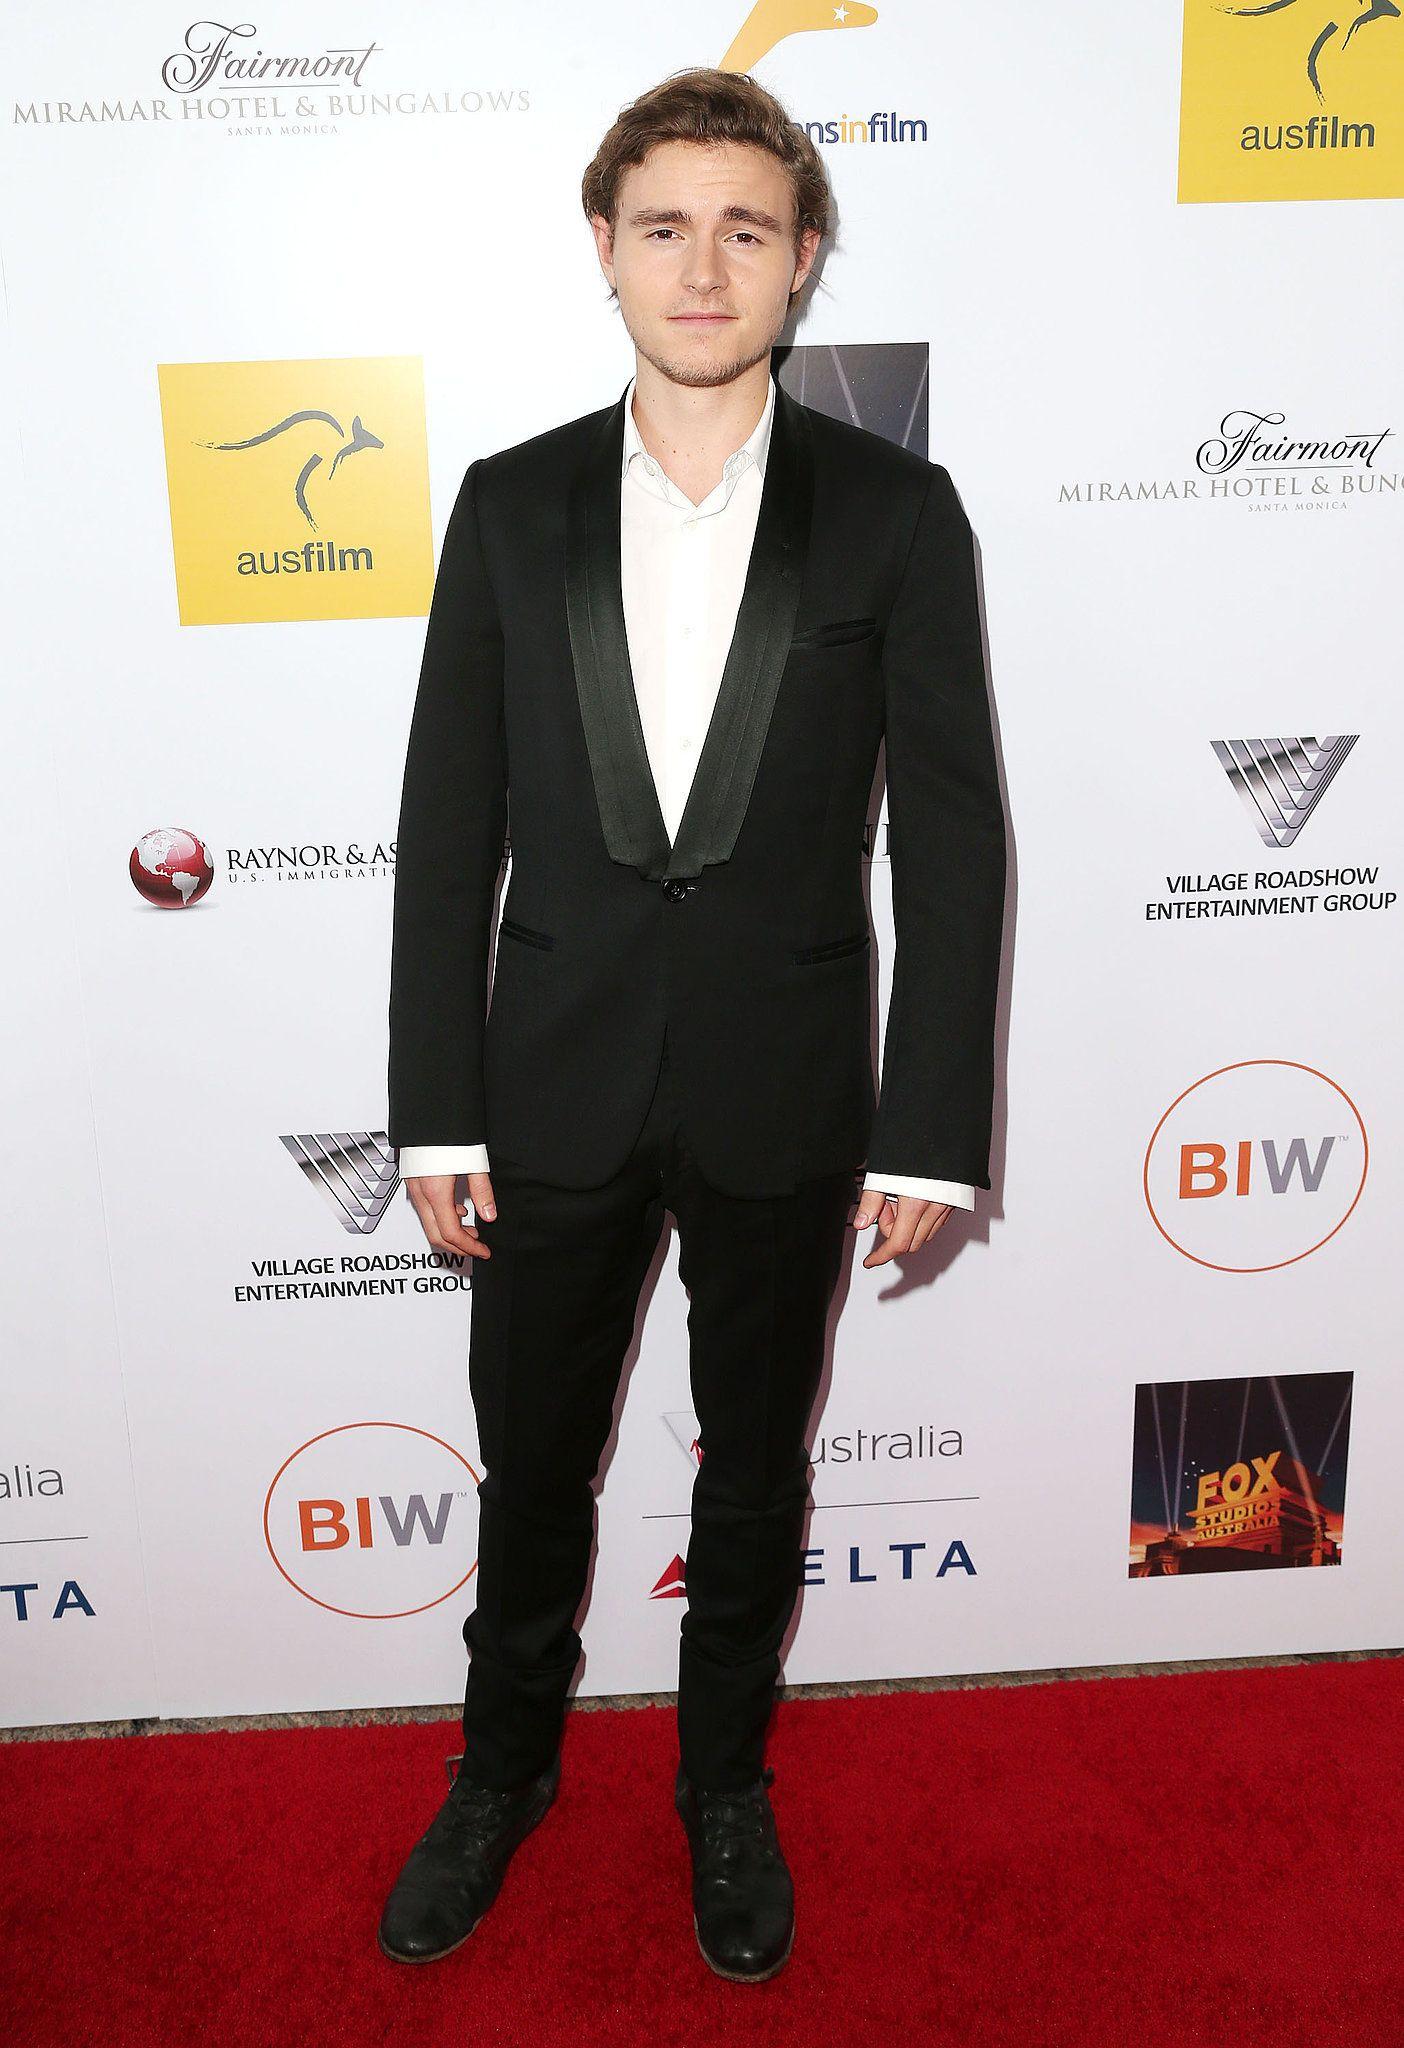 Callan McAuliffe at the 2014 Australians in Film gala dinner in LA.